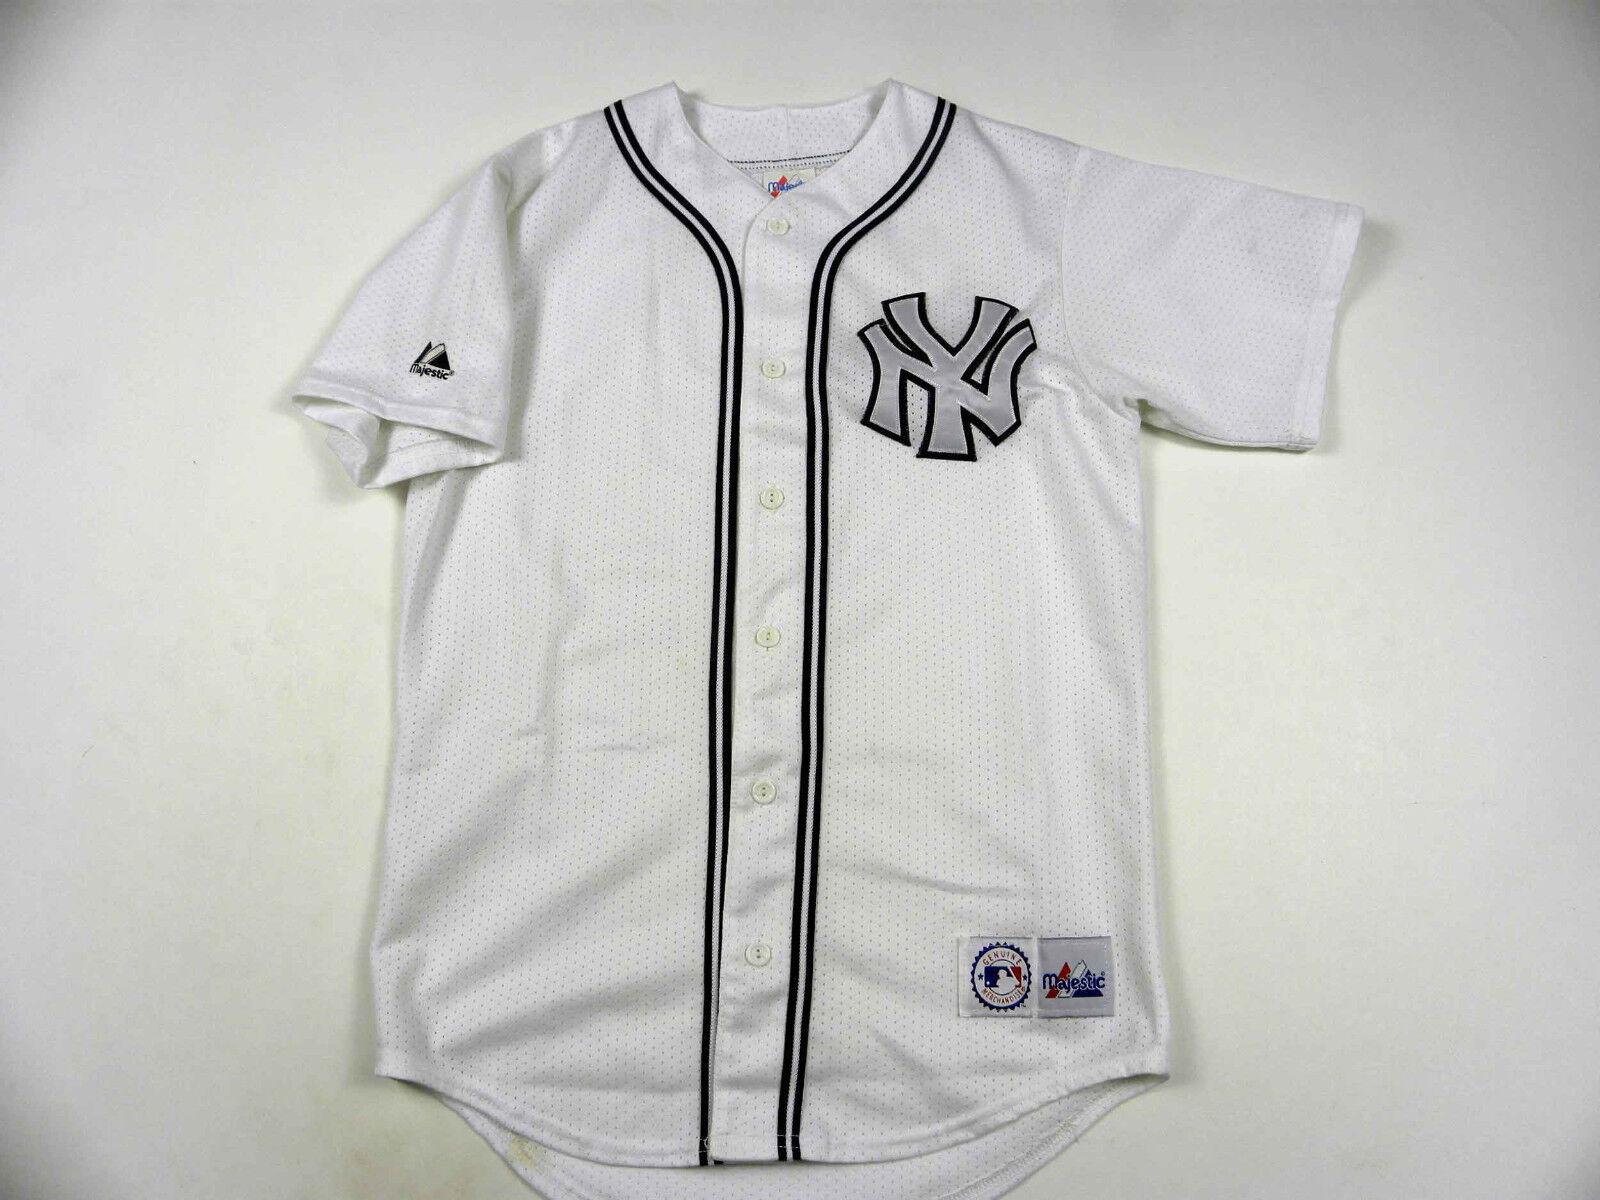 VINTAGE MLB Baseball New York Yankees Jersey Shirt made in USA